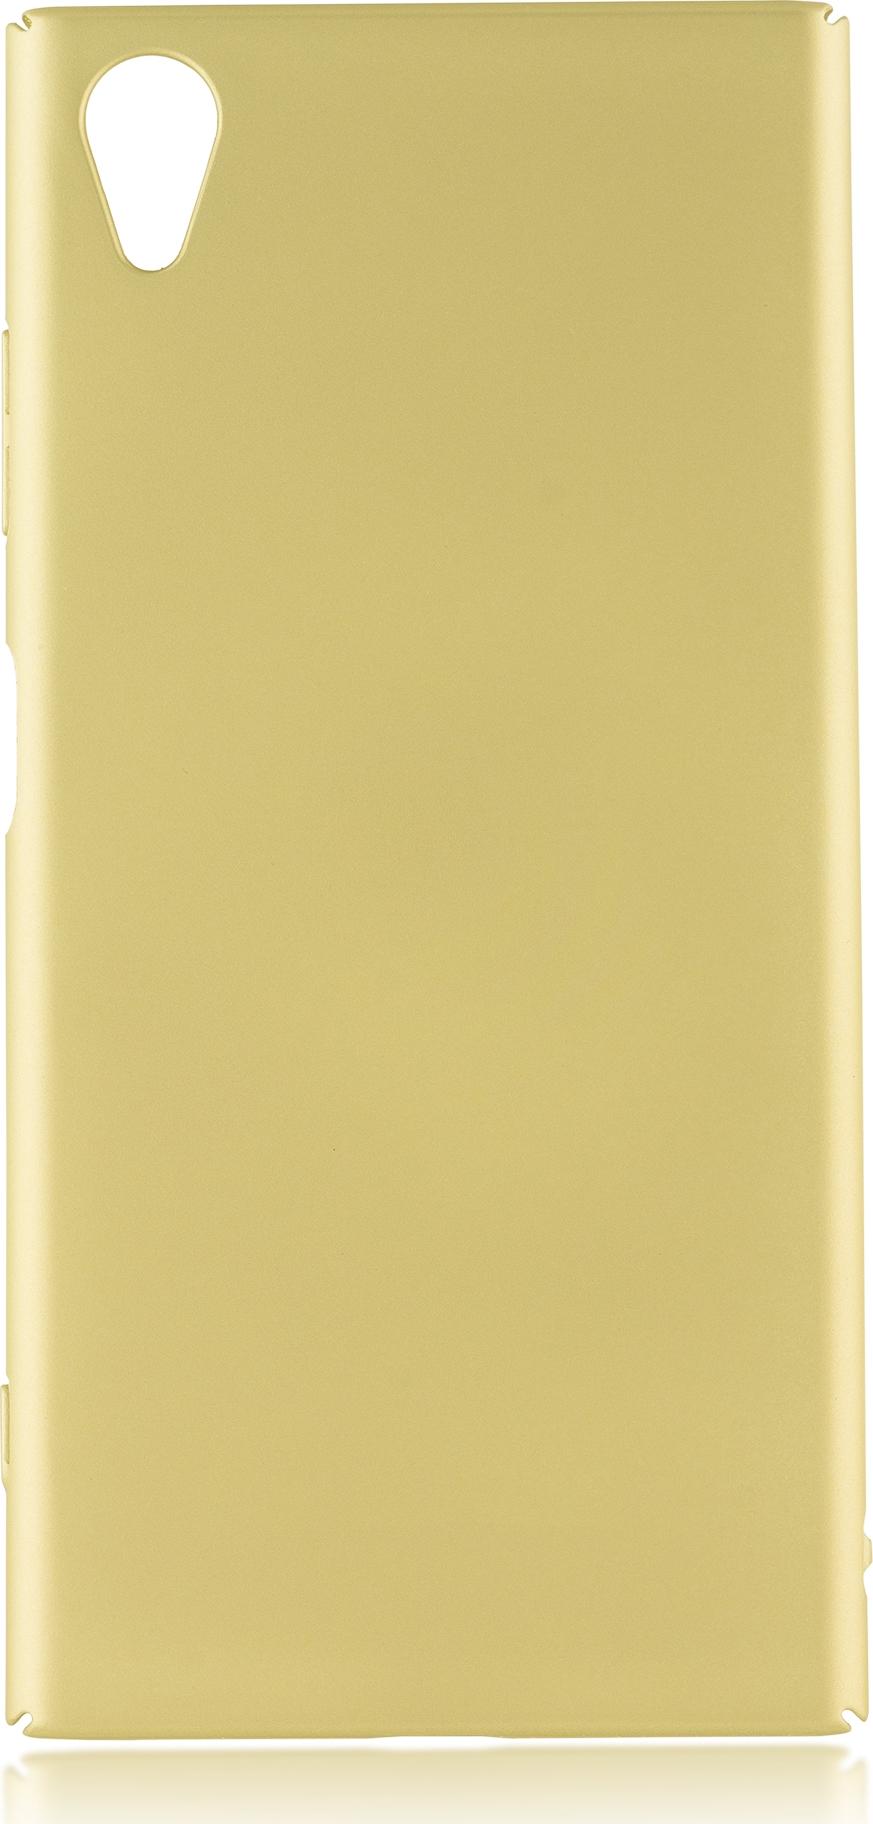 Чехол Brosco 4Side Soft-Touch для Sony Xperia XA1 Plus, золотой чехол для sony i4213 xperia 10 plus brosco силиконовая накладка черный